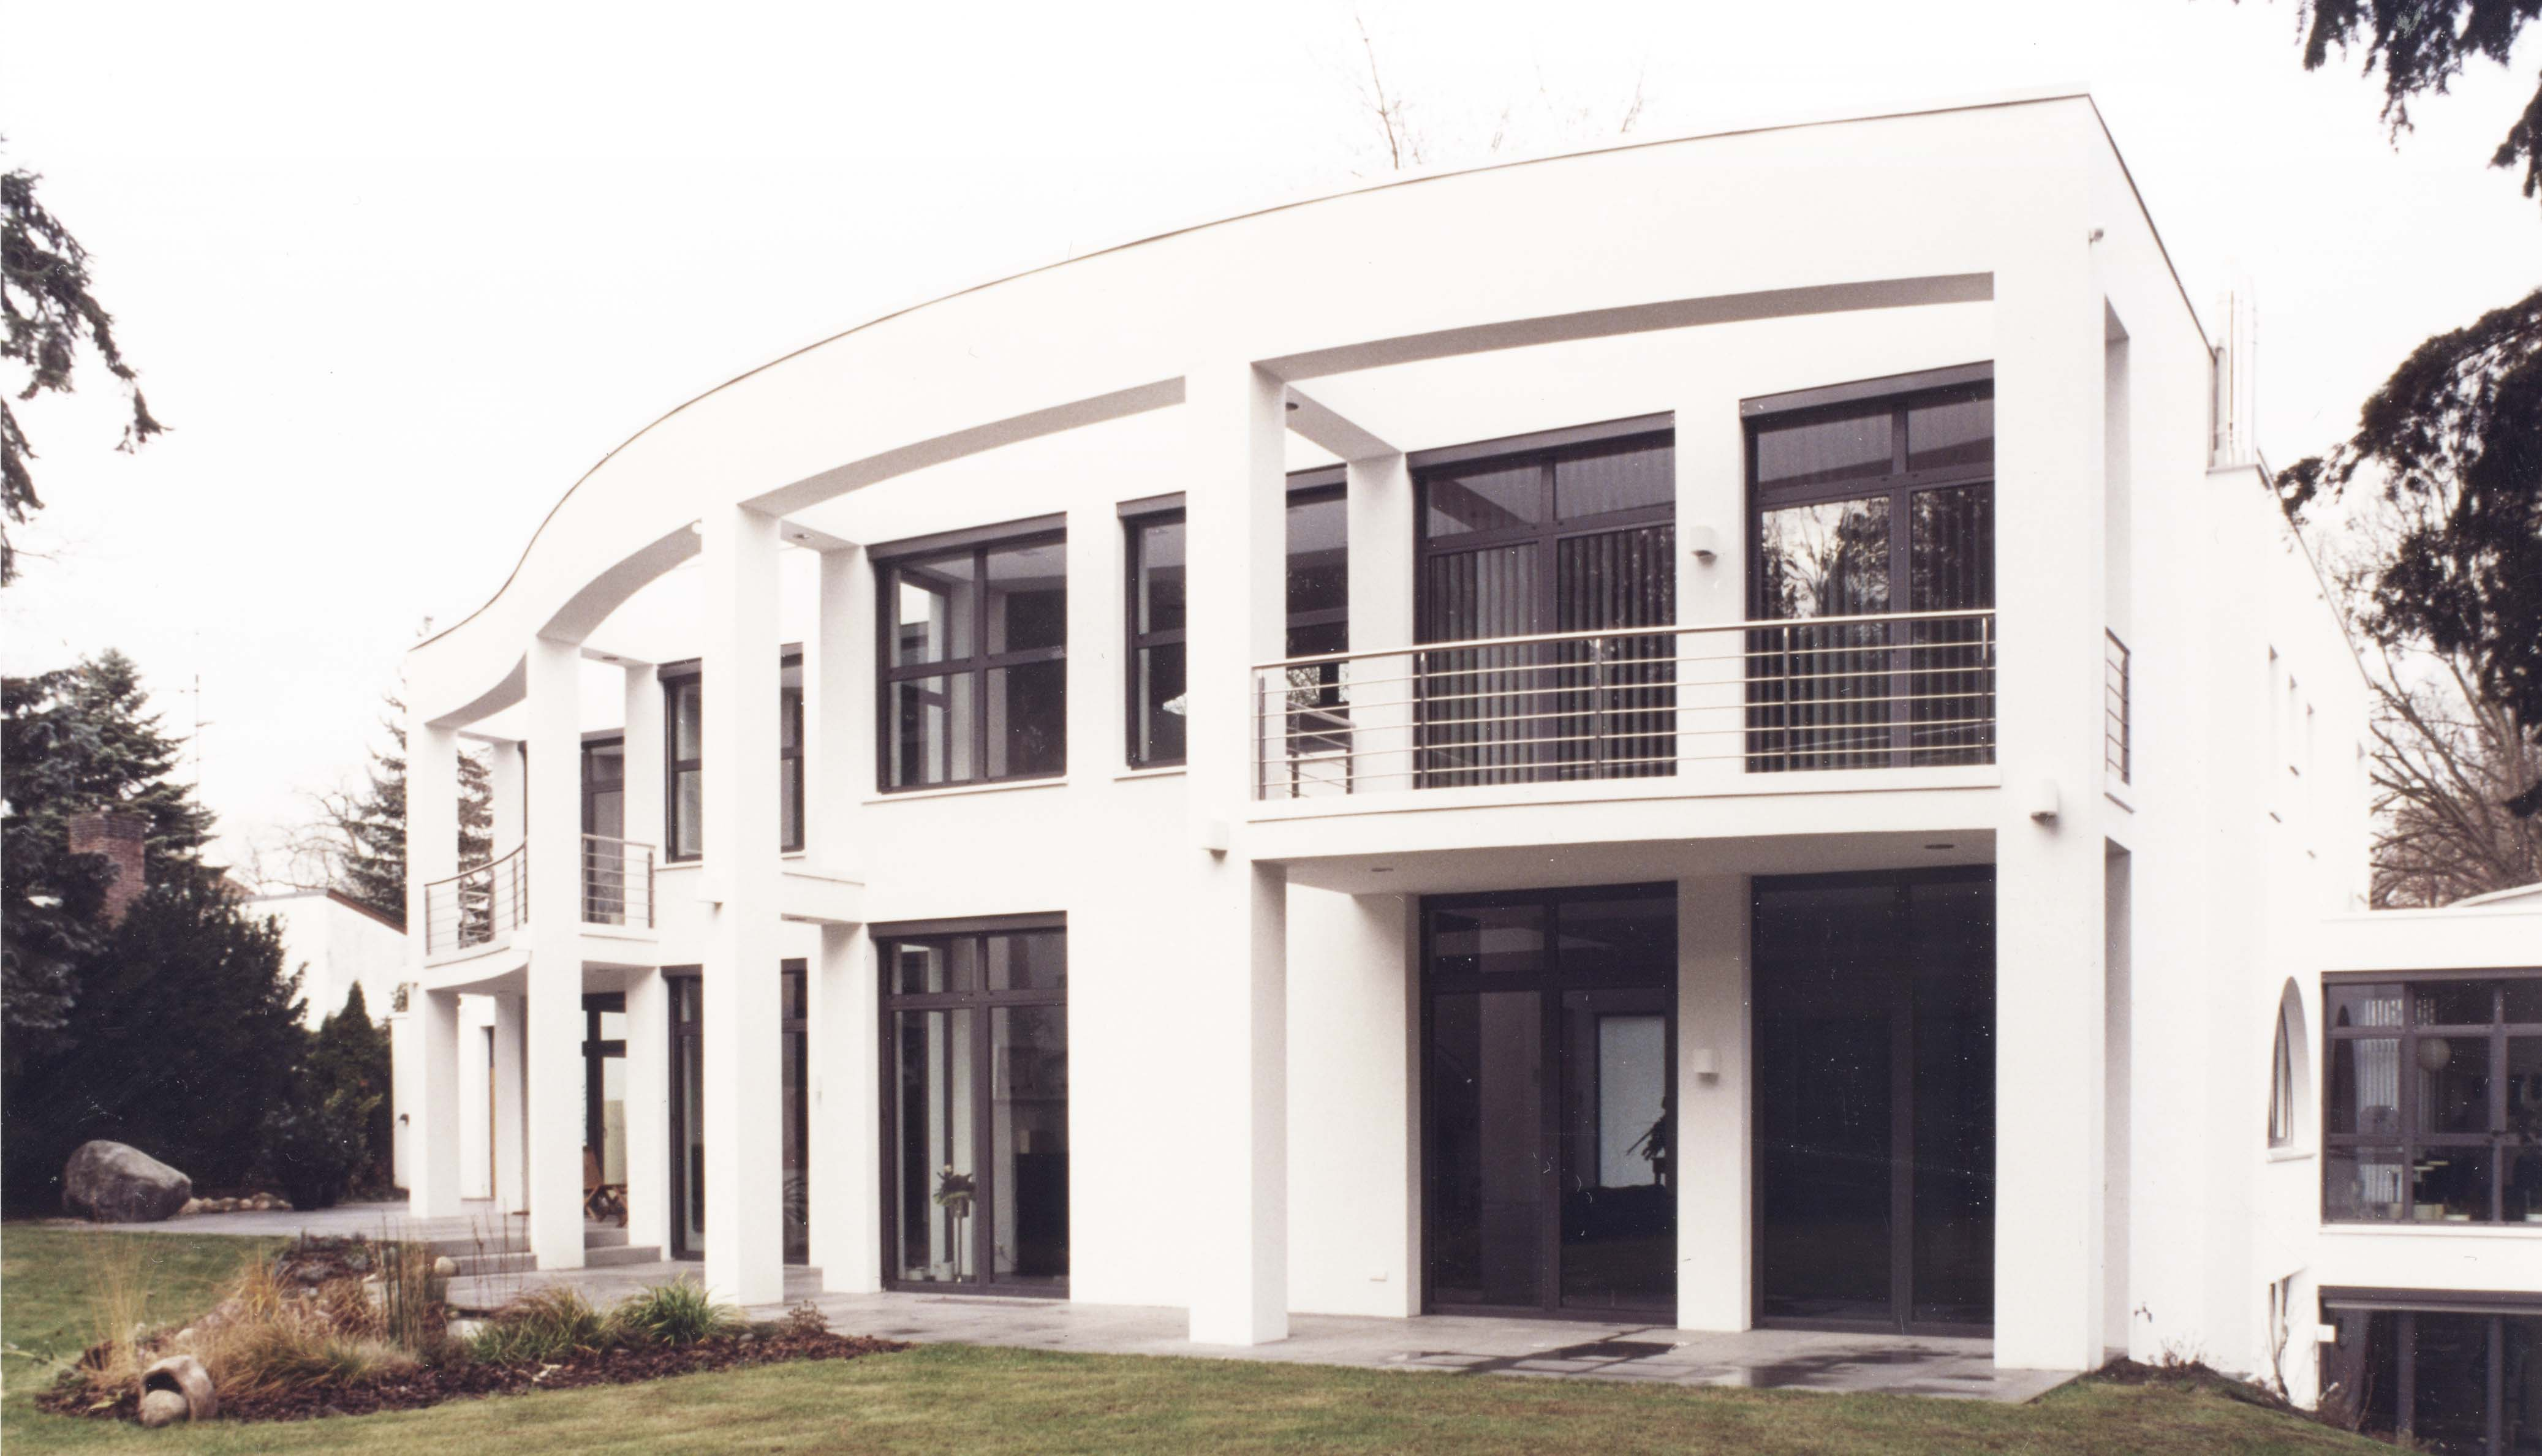 35 Villa in Westend 07